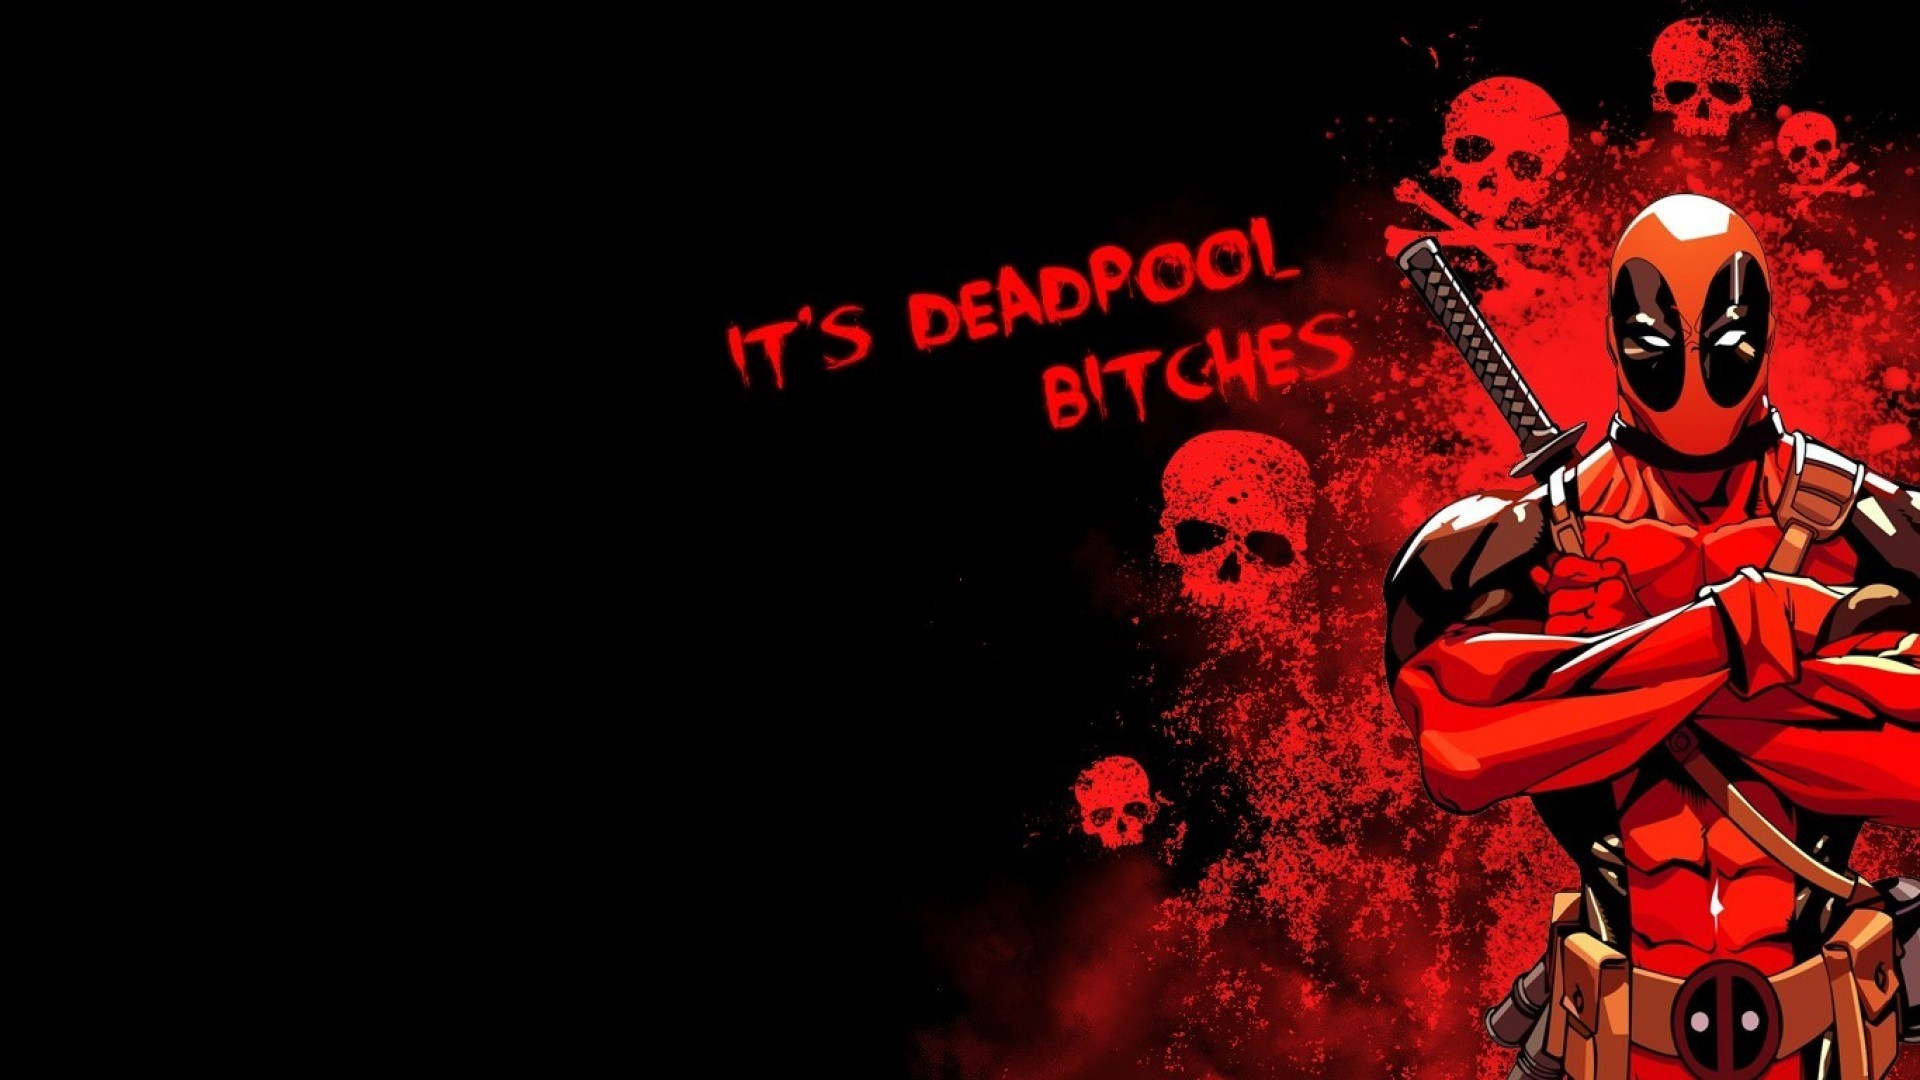 Favorite Superheroes | Pinterest | Deadpool, Deathstroke and Deadpool  wallpaper